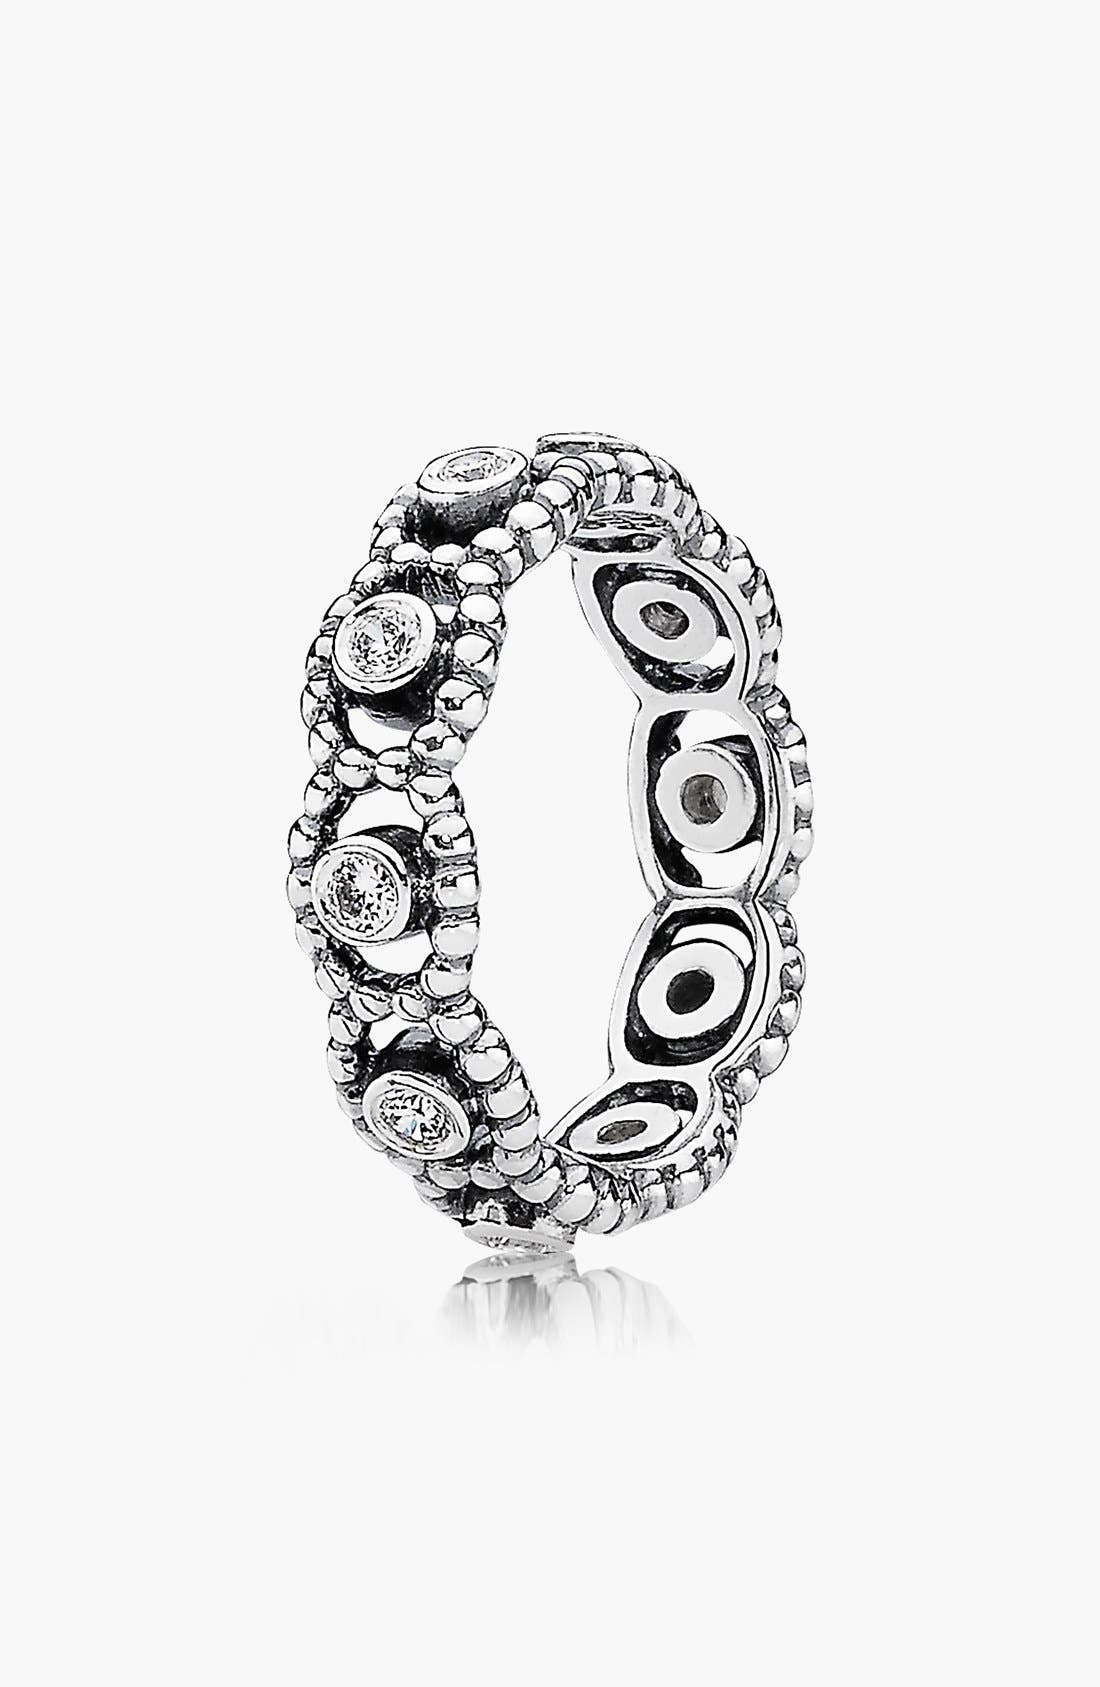 Alternate Image 1 Selected - PANDORA 'Her Majesty' Band Ring